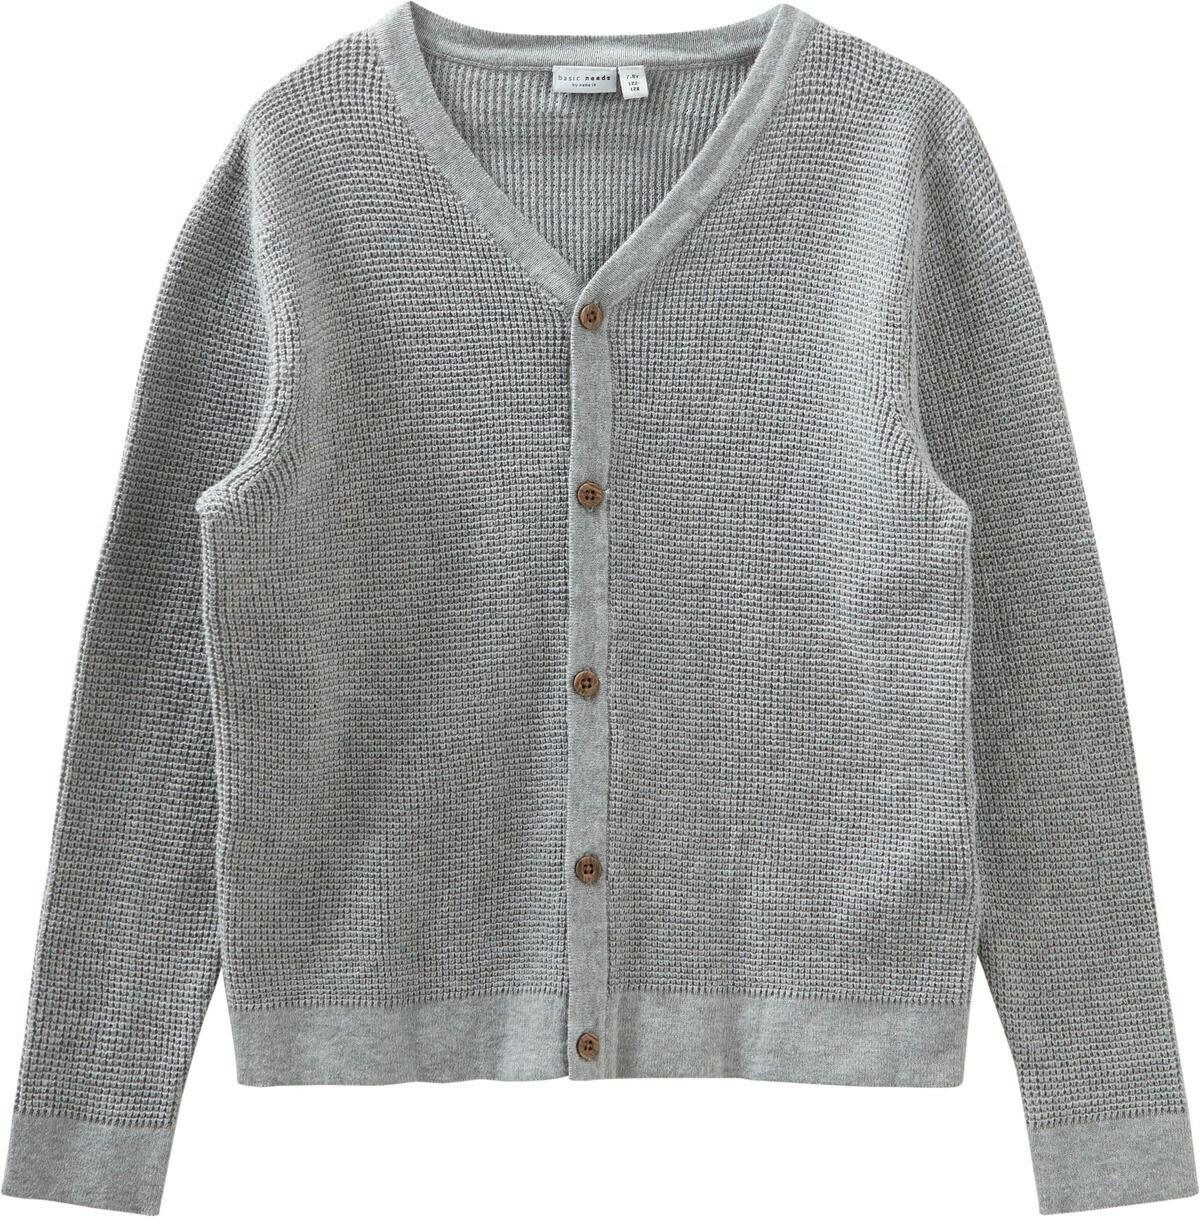 (*) KIDS Gebreide vest - VILTON - licht grijs